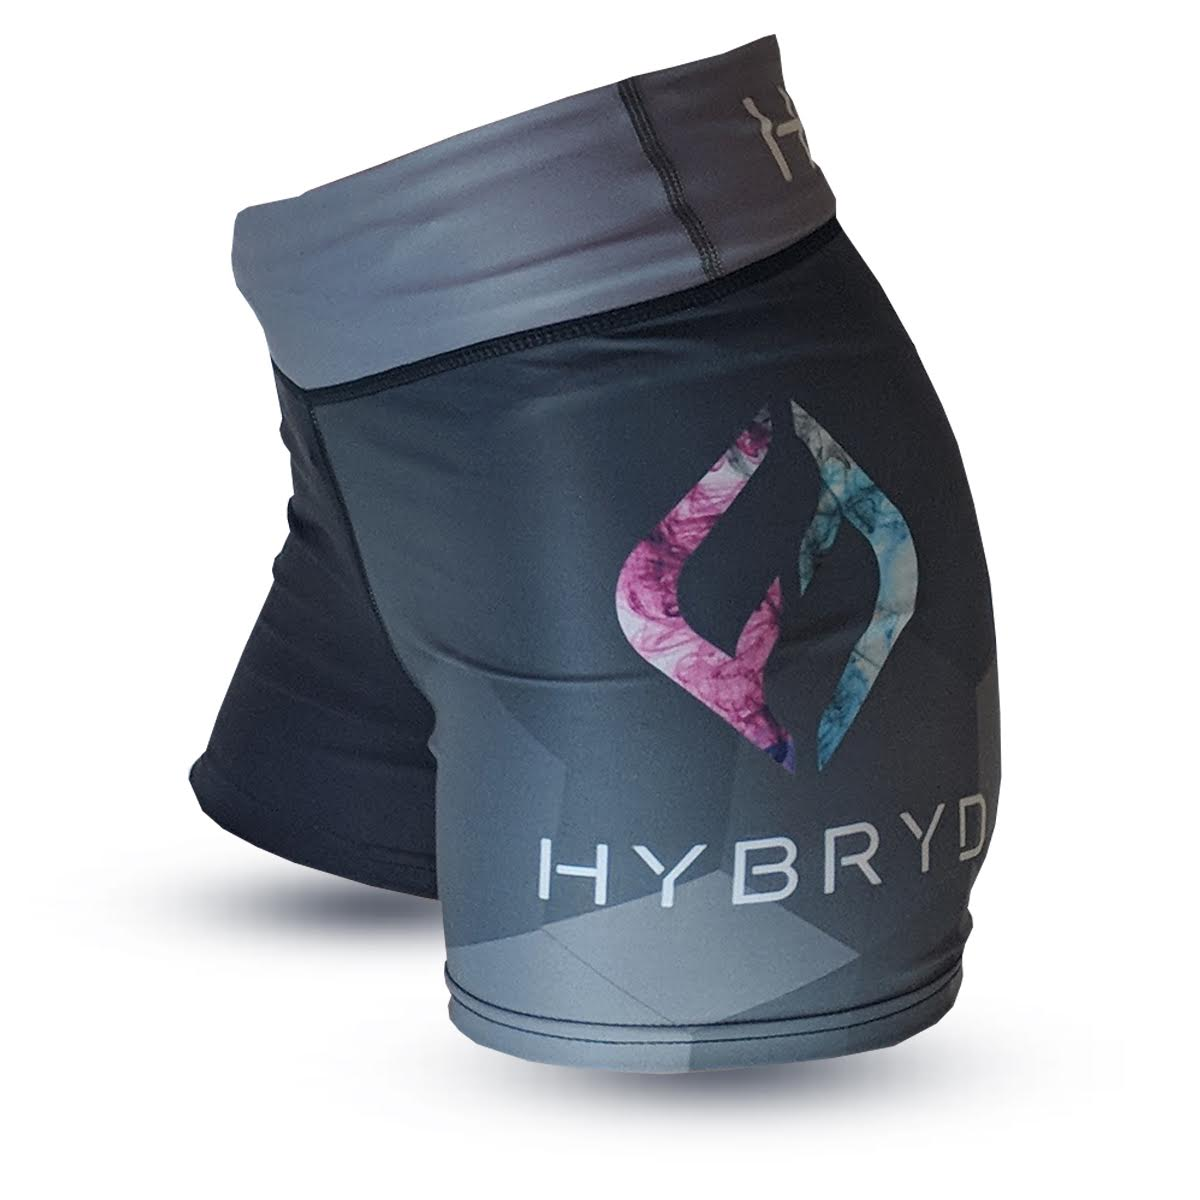 Hybryd Patriot Hex Short